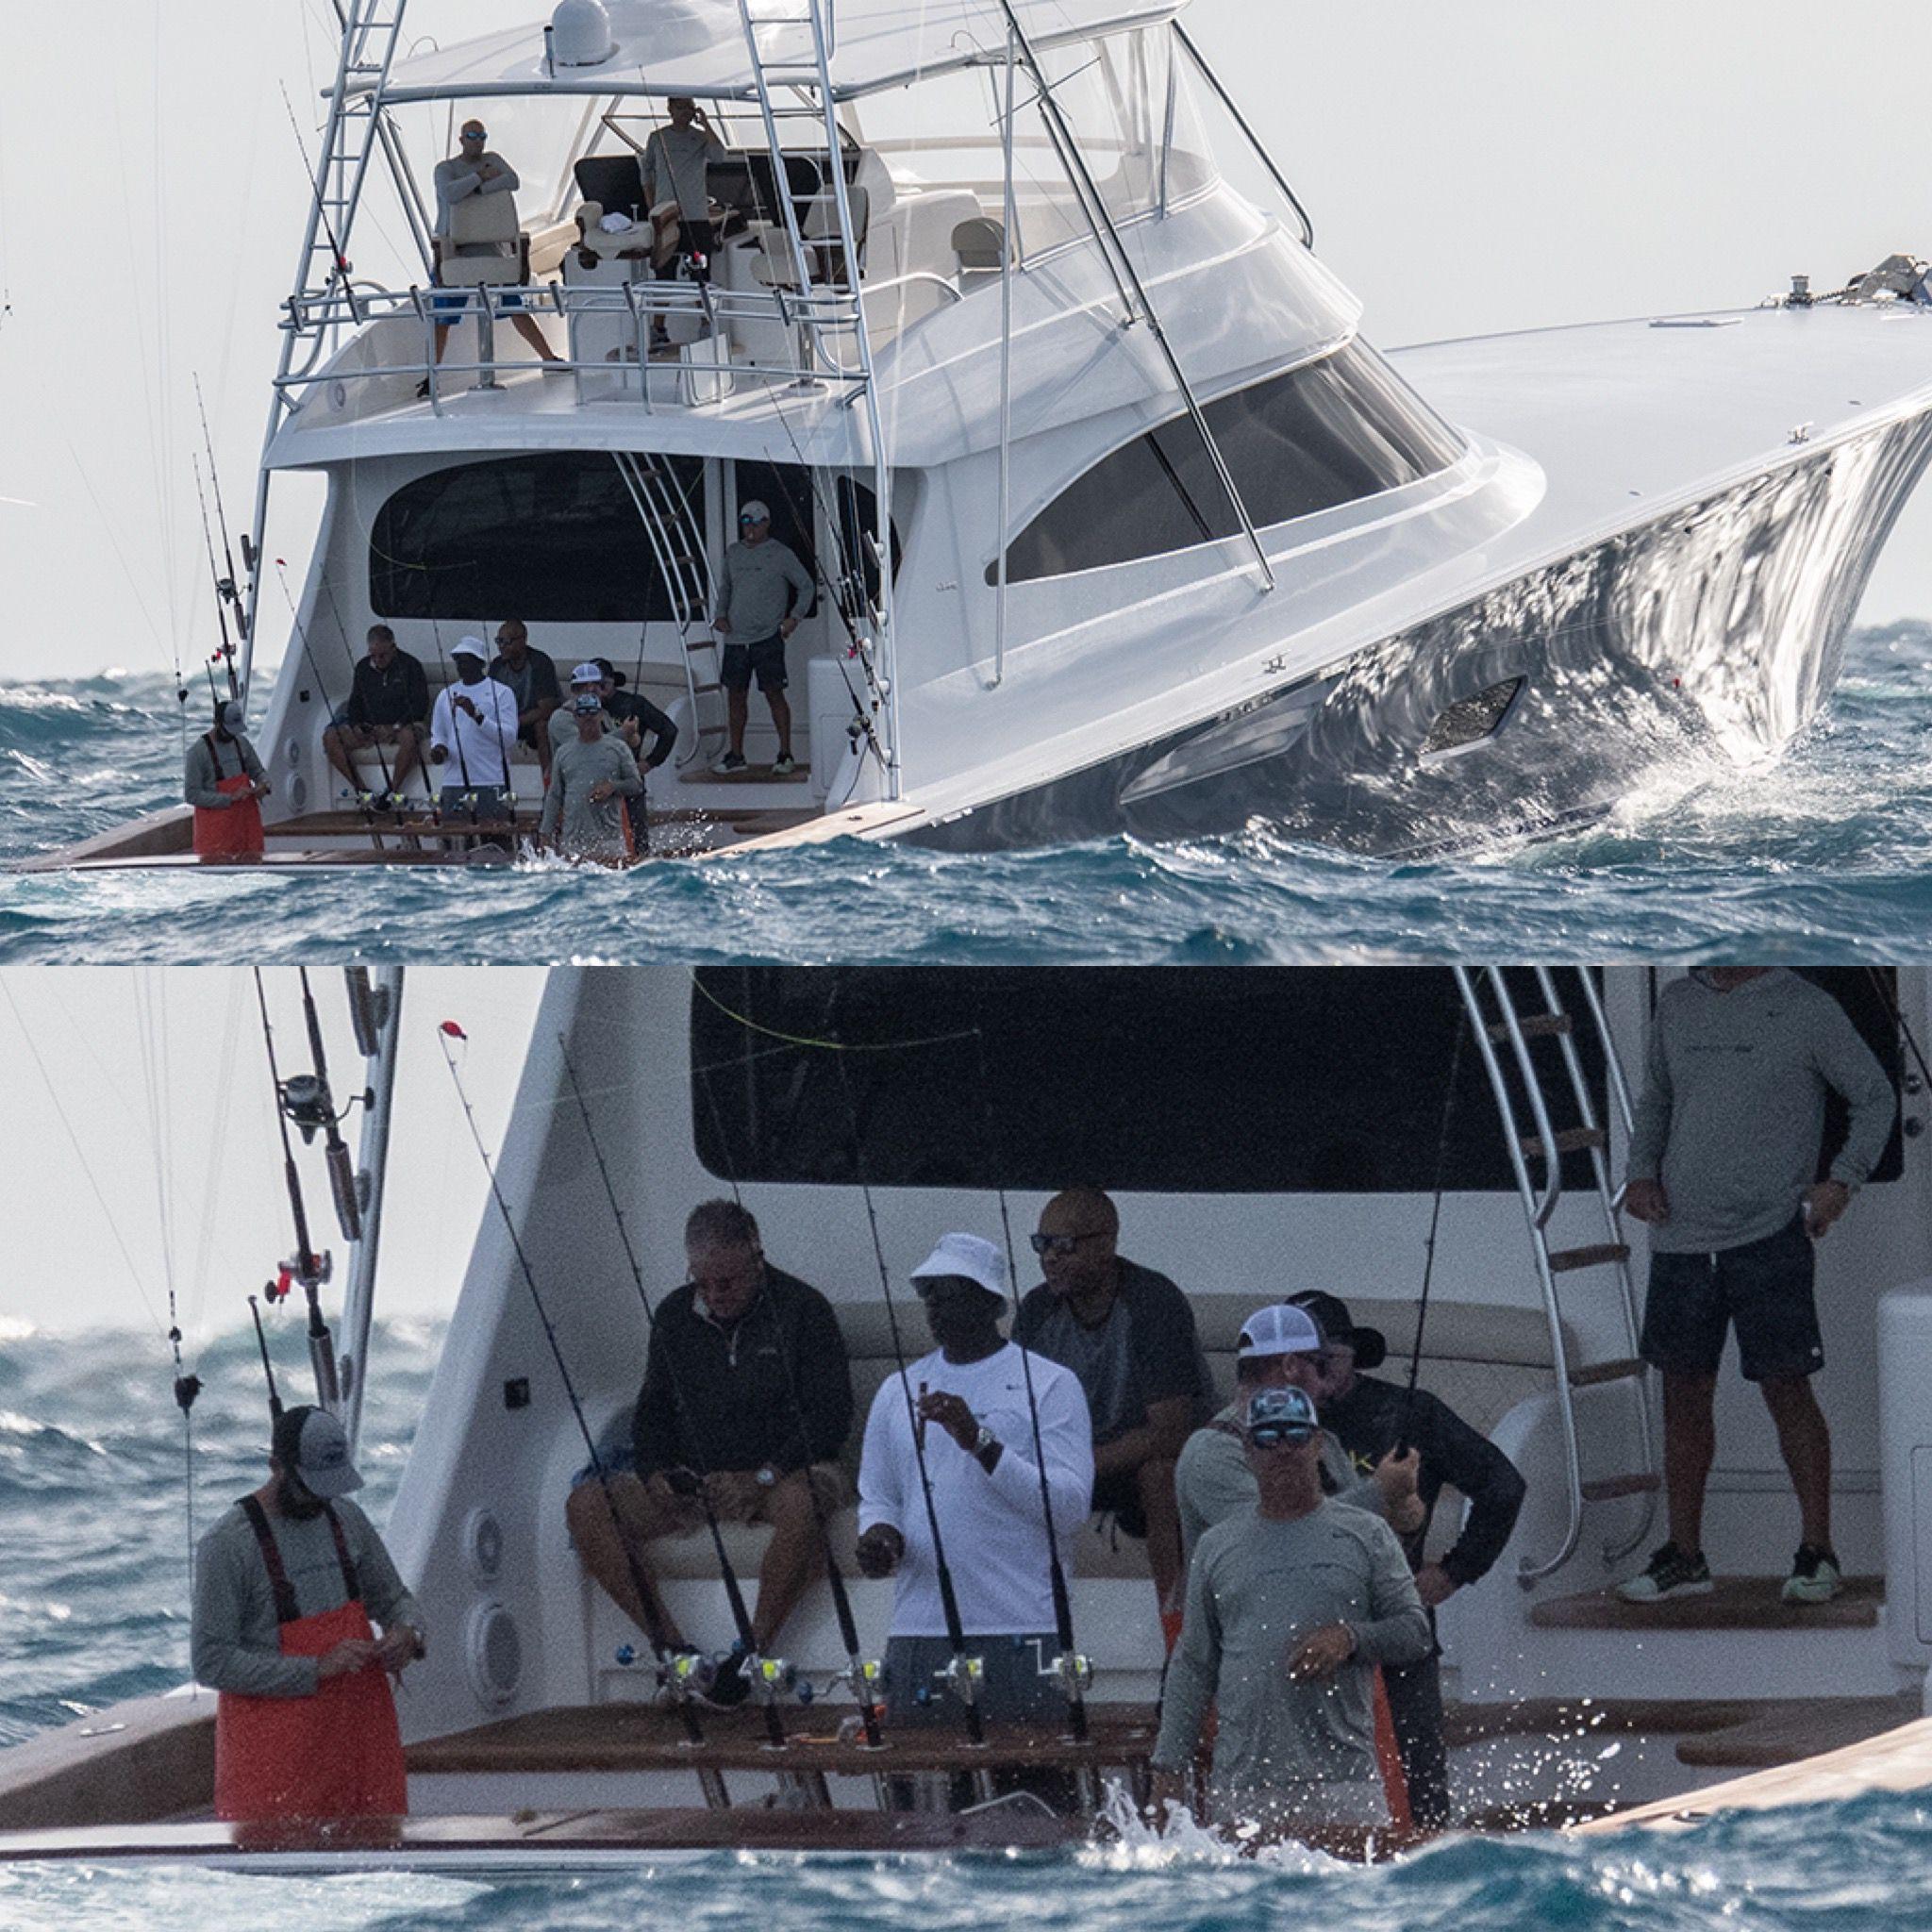 Photo Of Basketball Great Michael Jordan Fishing On His Boat